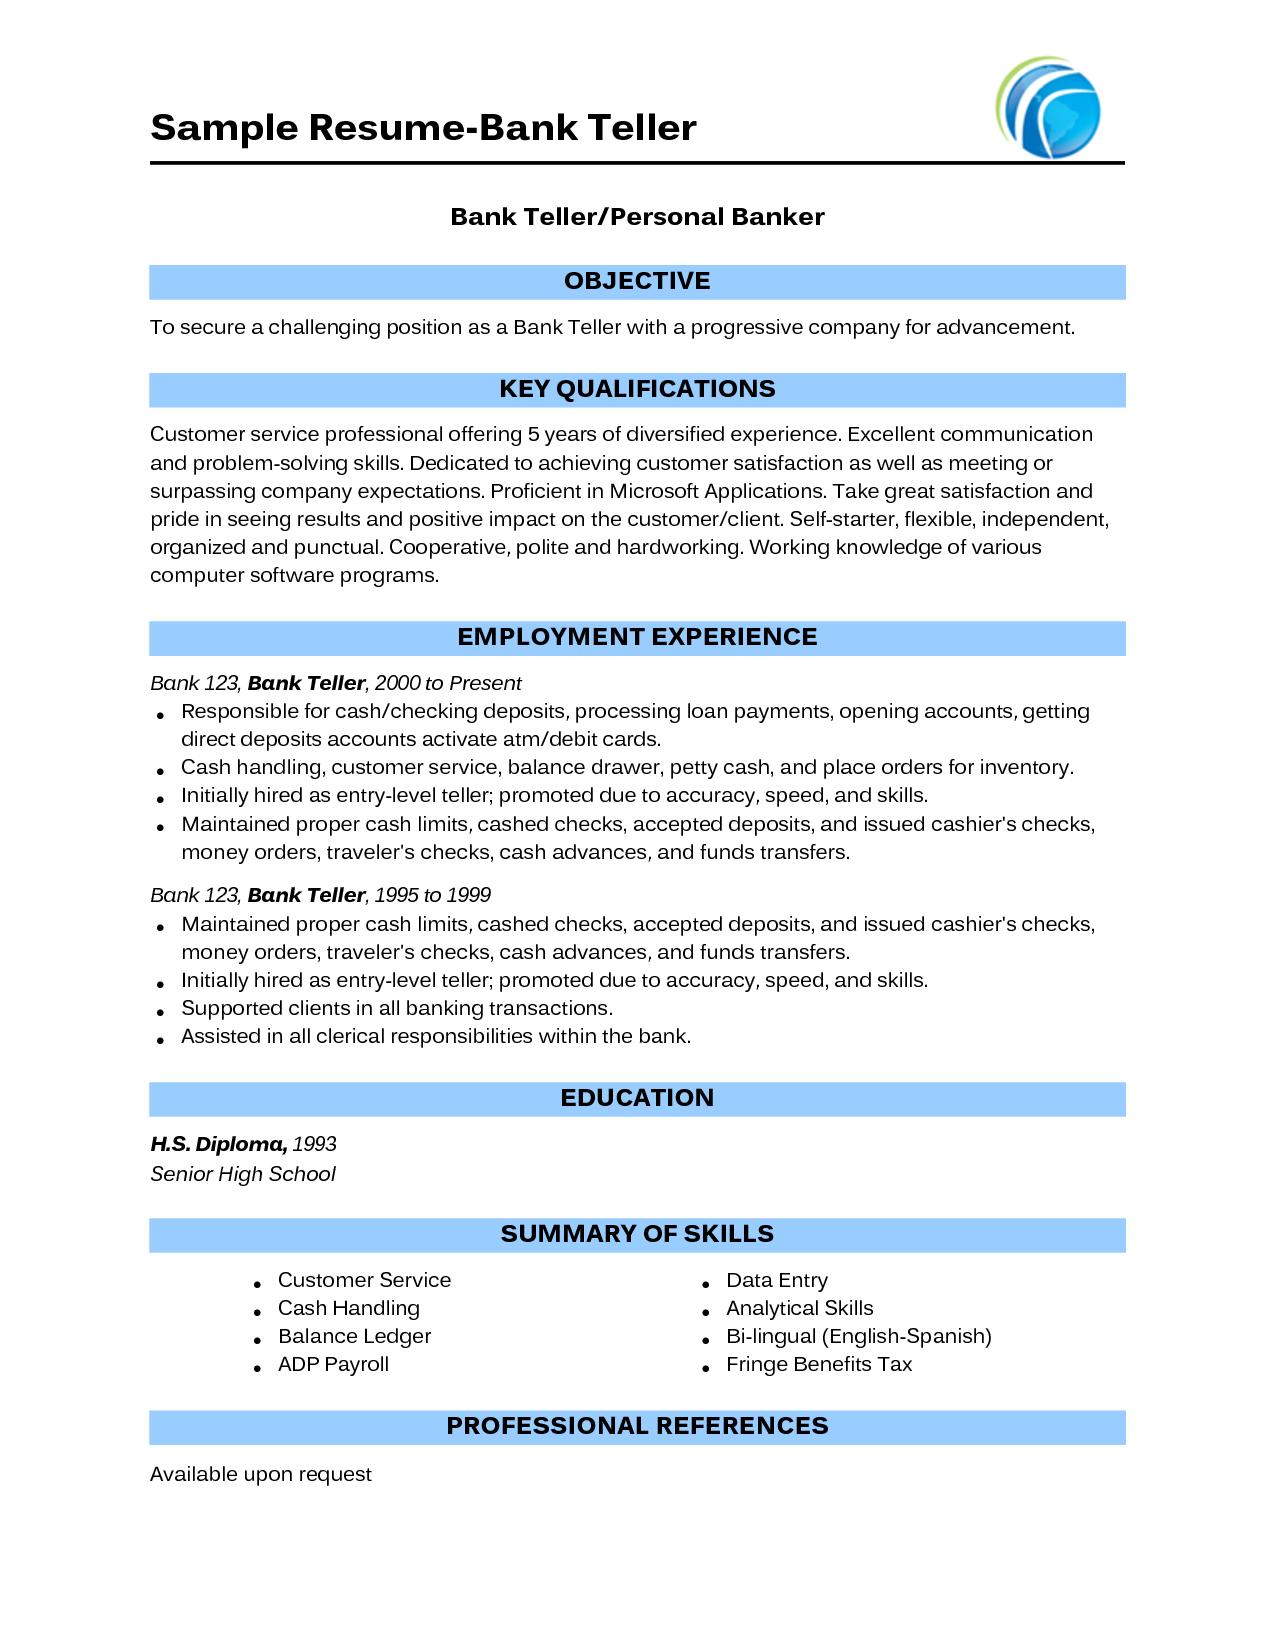 Teller Resume With No Experience Sample Resume Bank Teller Bank Teller Resume Resume No Experience Bank Teller